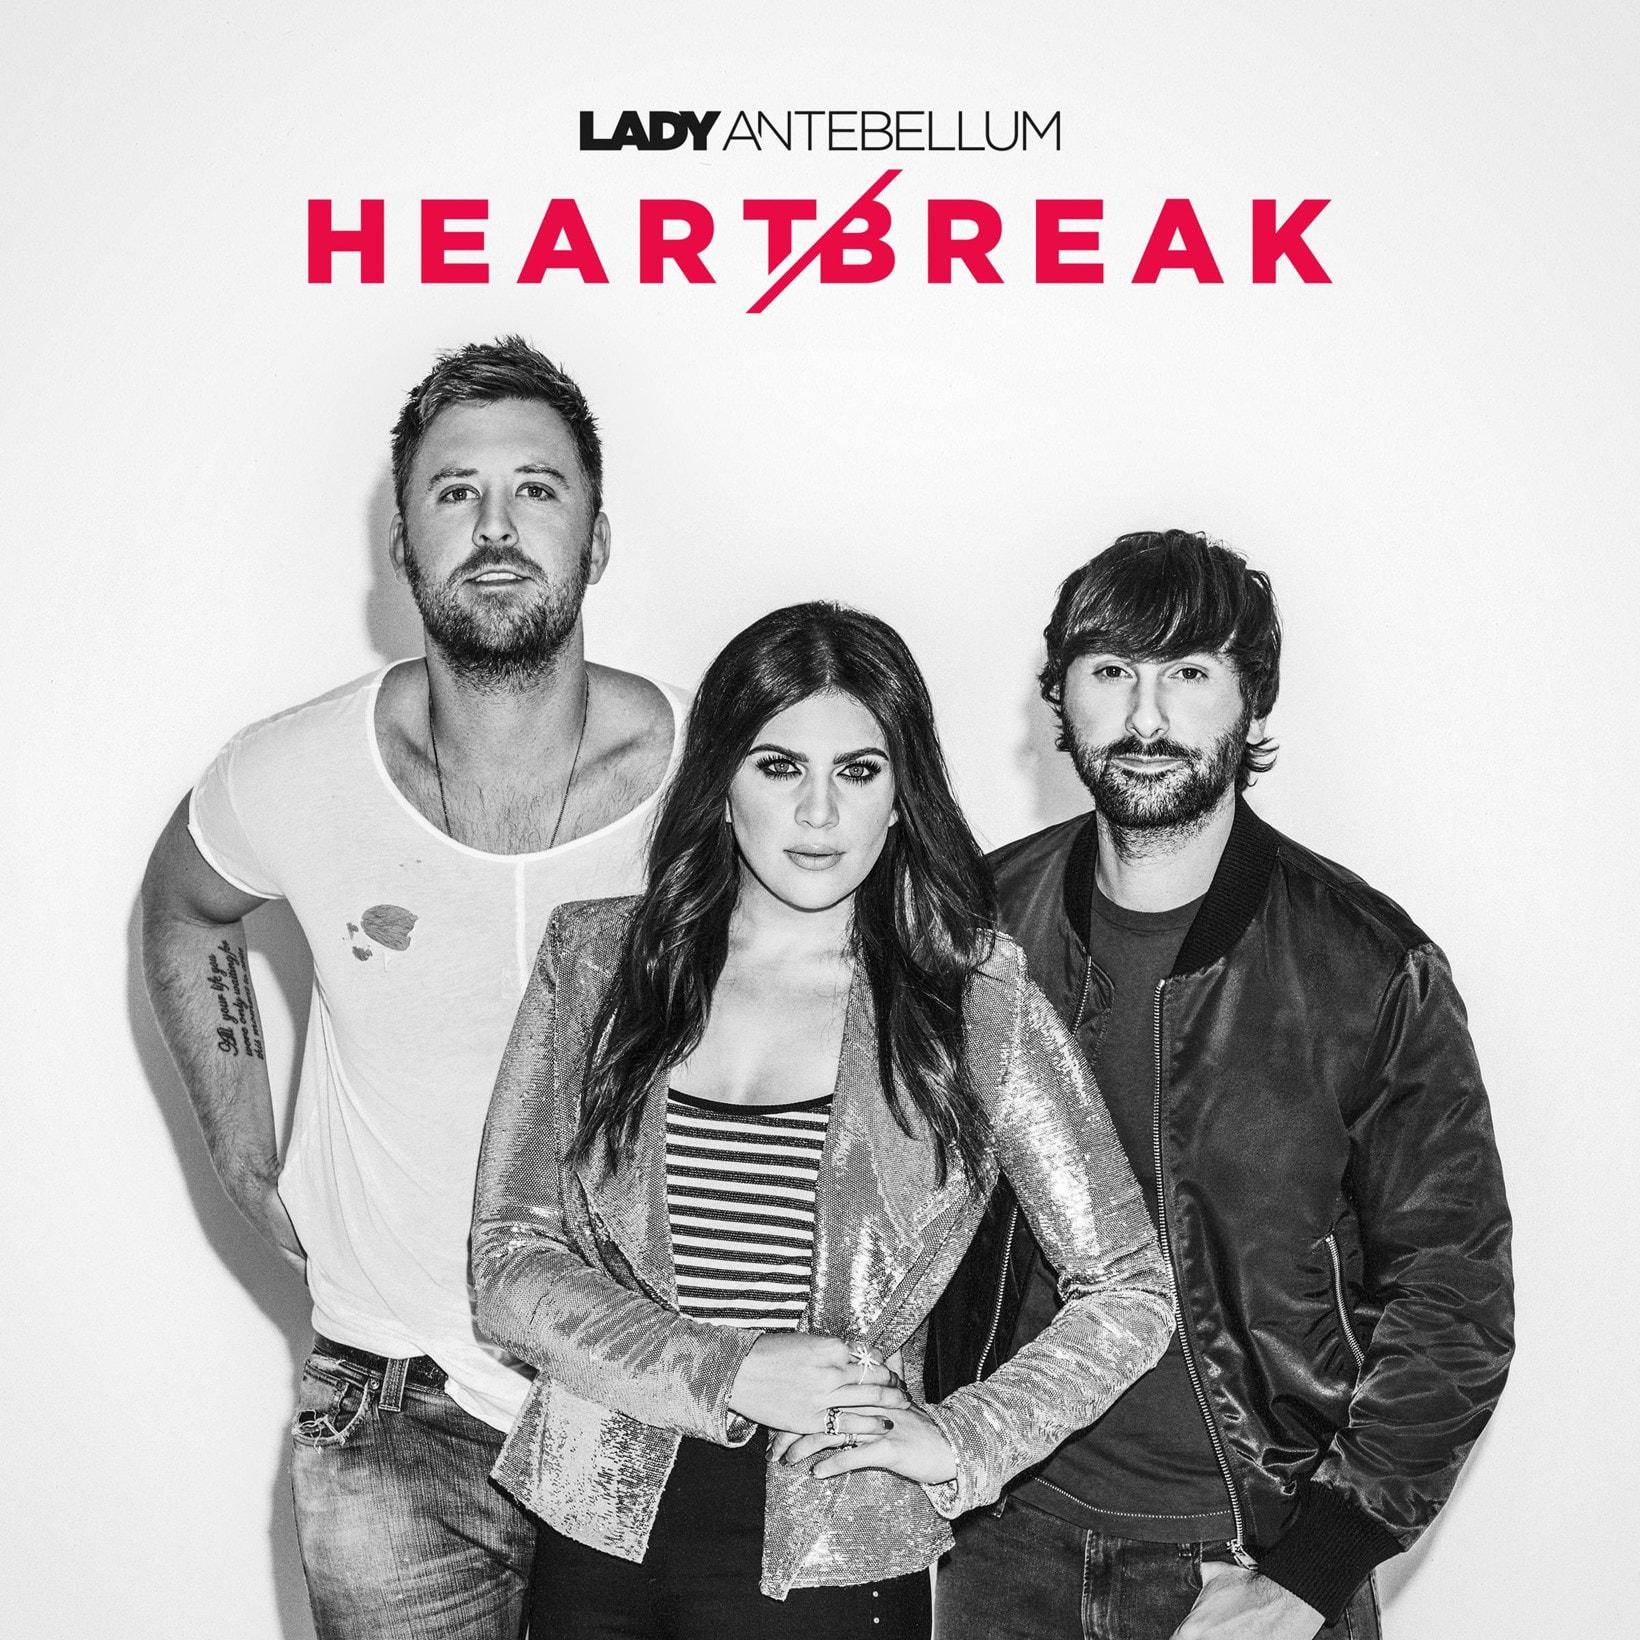 Heart Break Lady Antebellum - Staff Pick